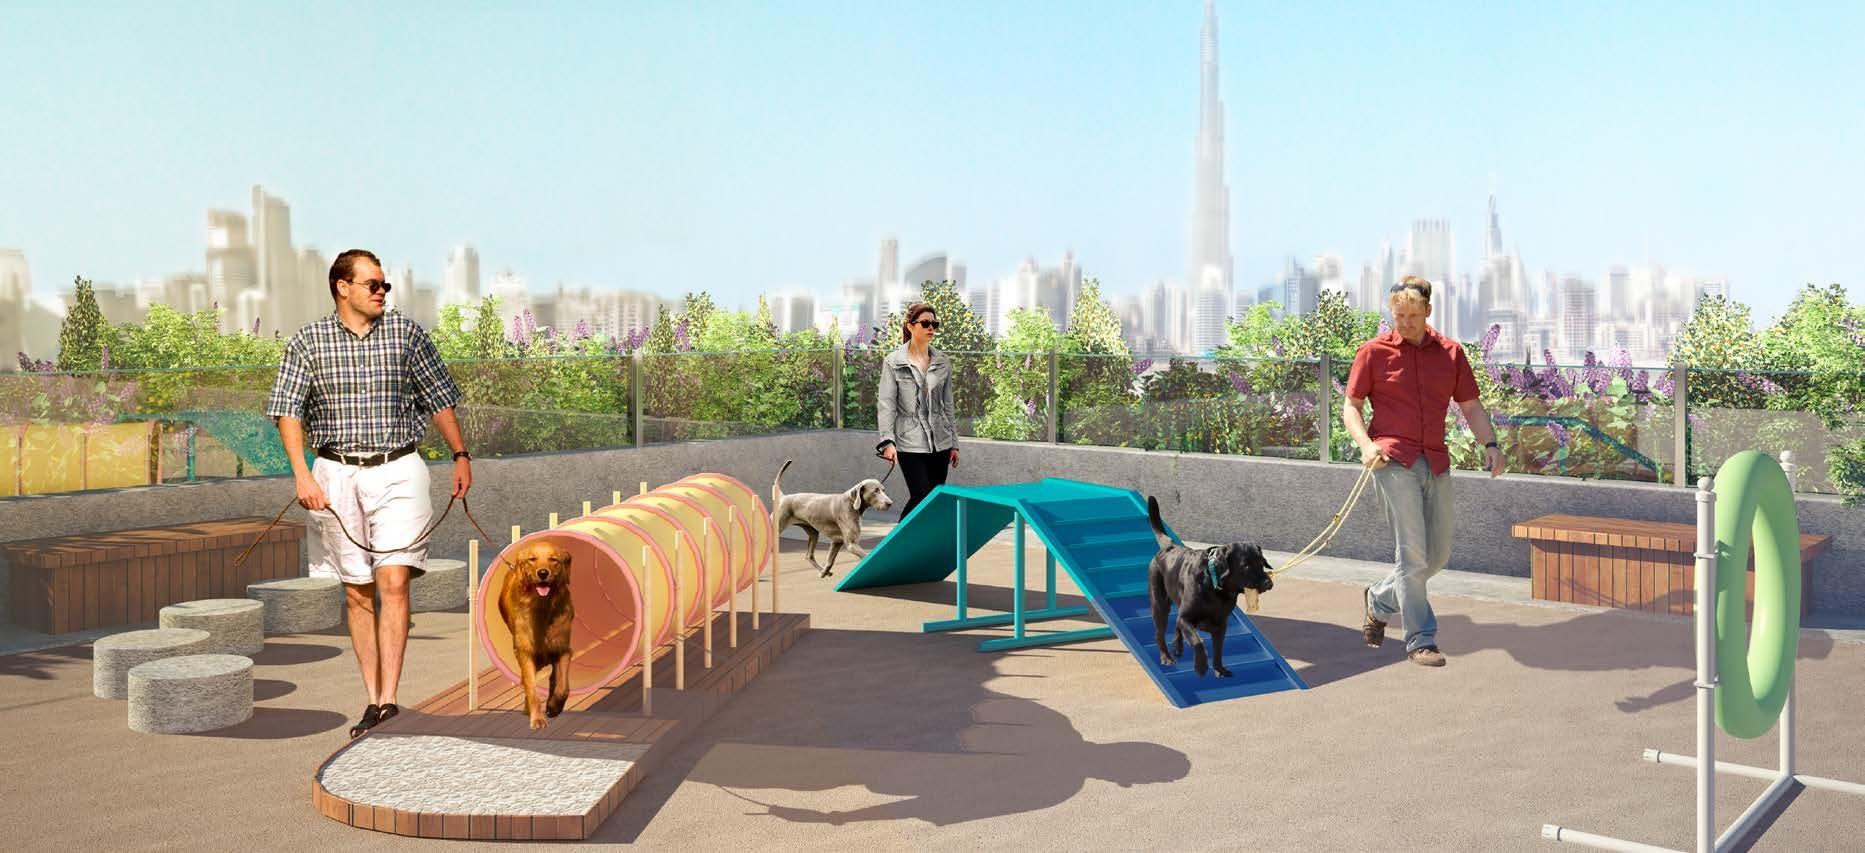 Pets agility area